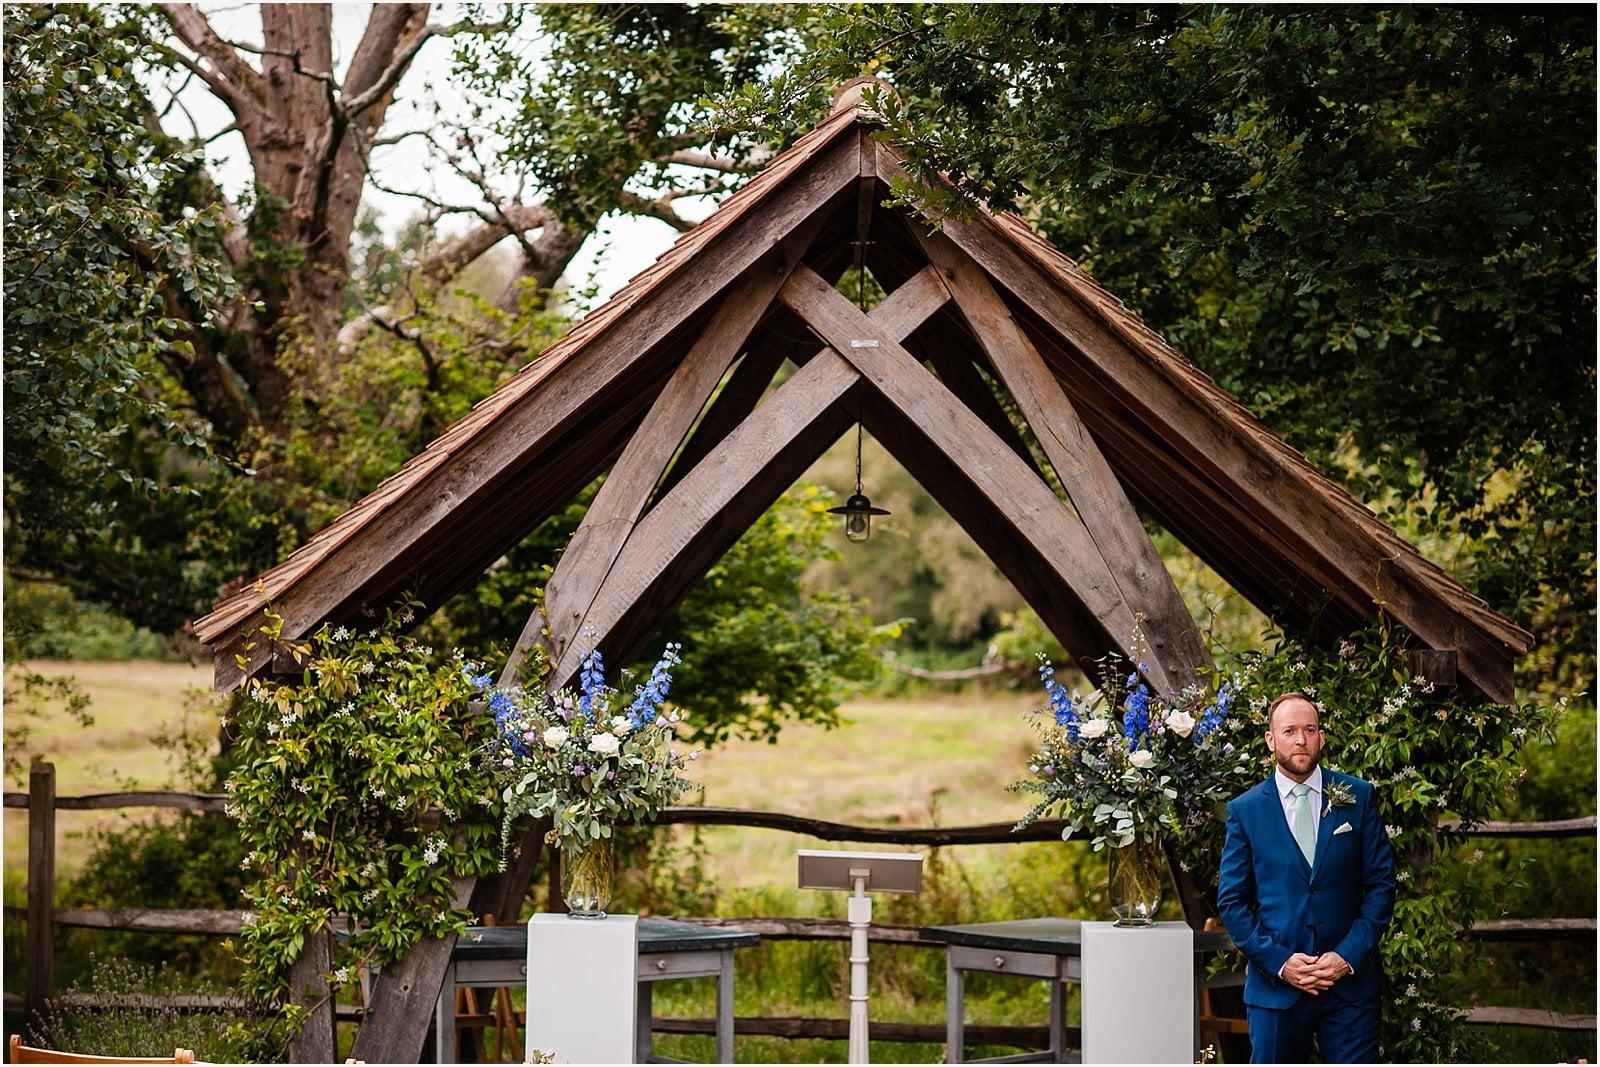 Millbridge Court Wedding - stunning summer wedding - wedding photography 24